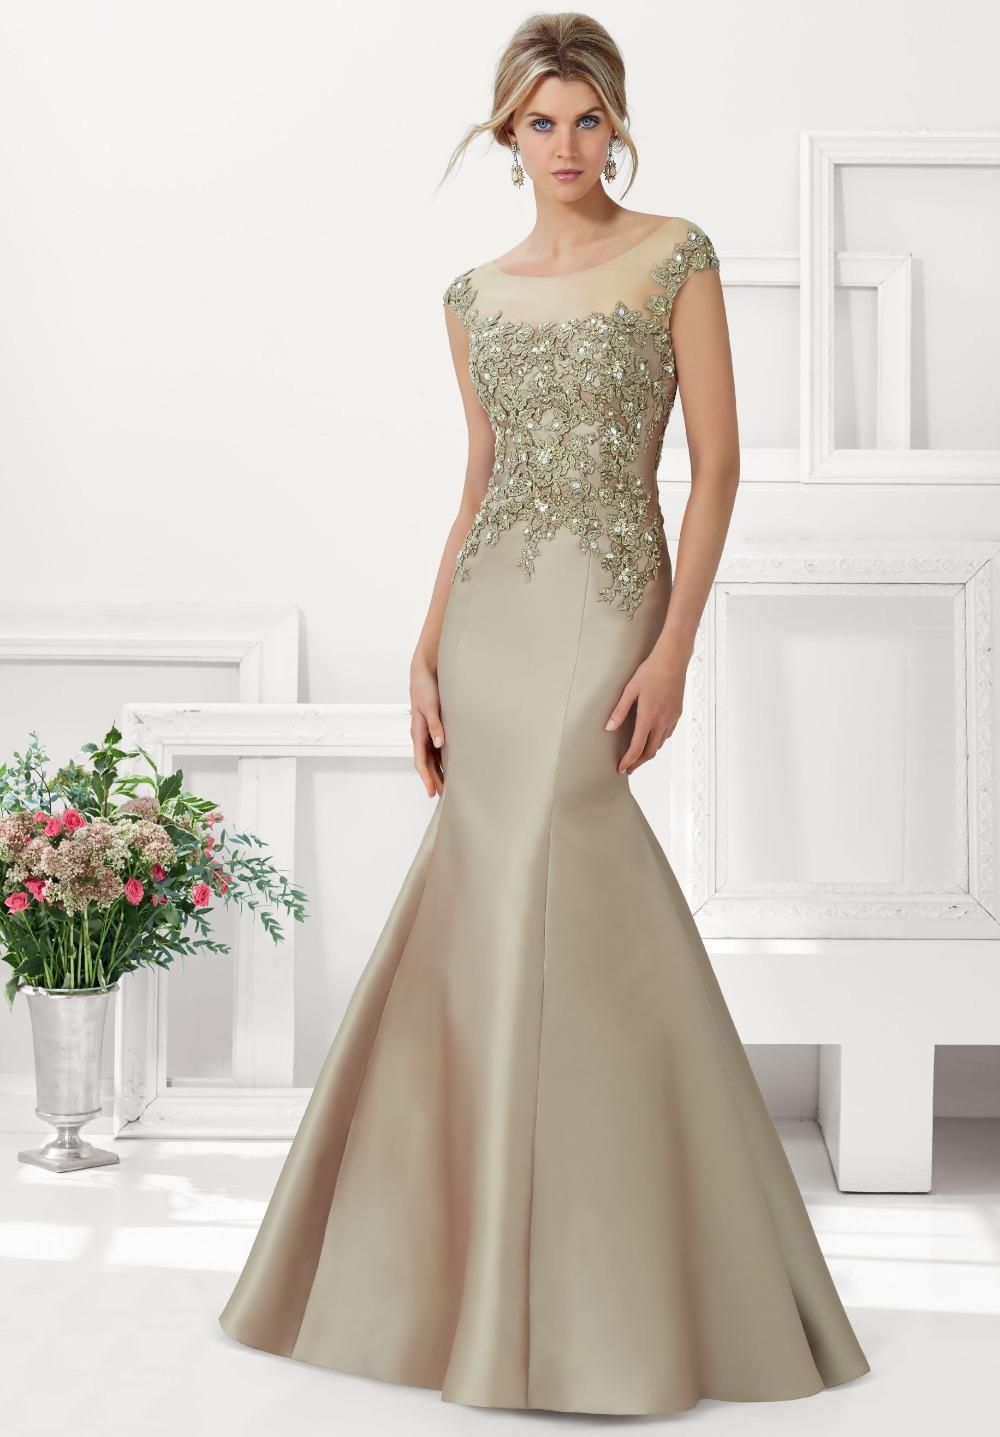 weddings events vine mother bride dresses